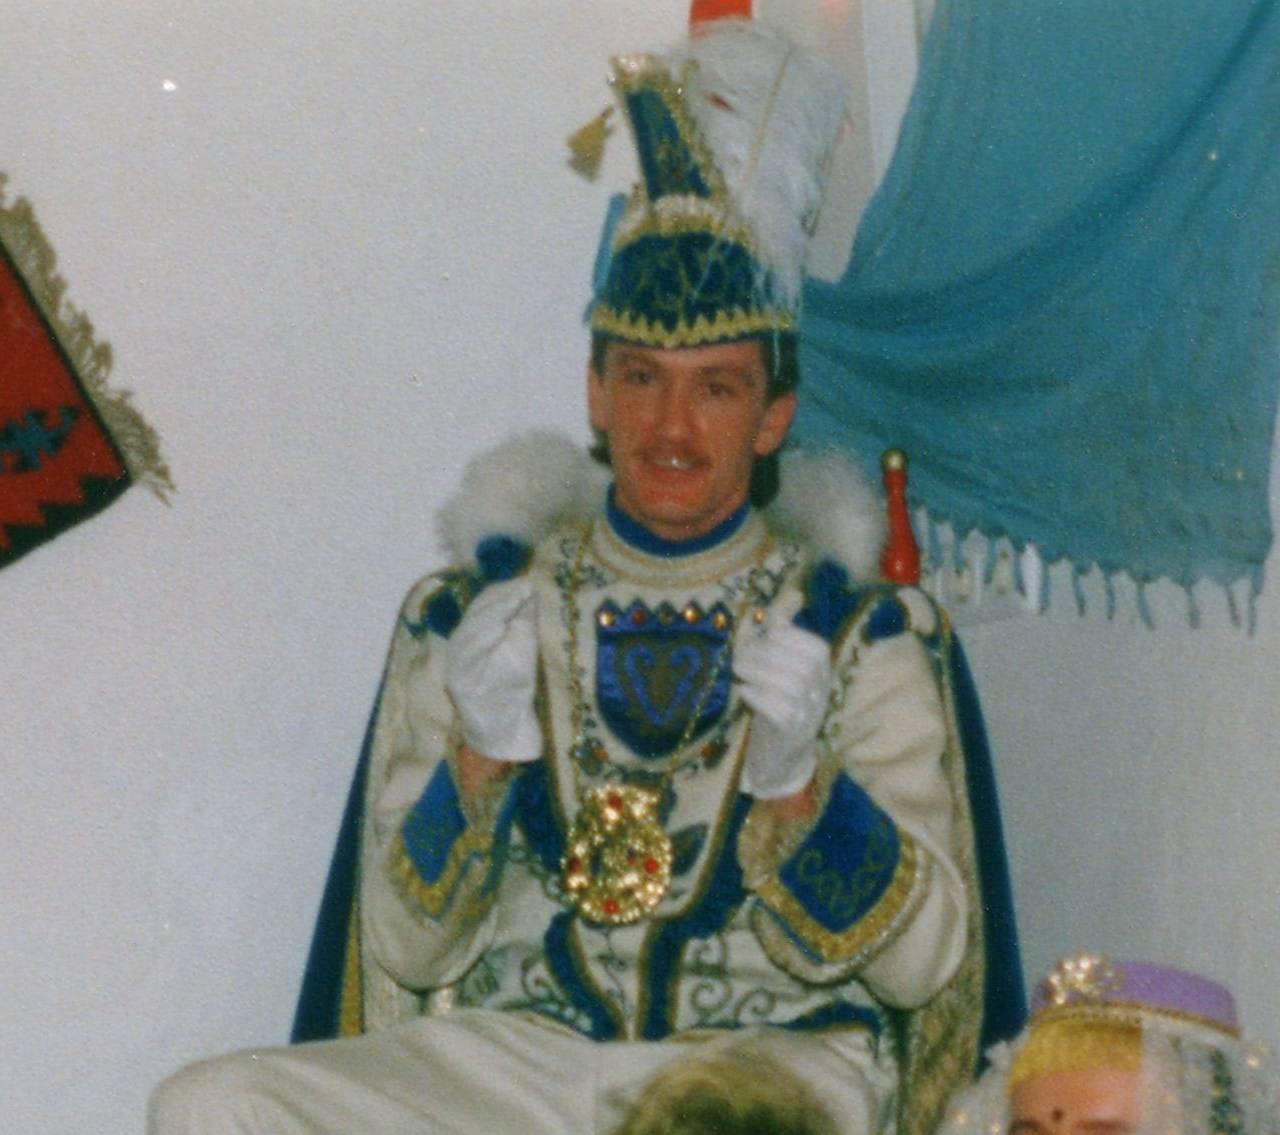 Prinz 1995/96